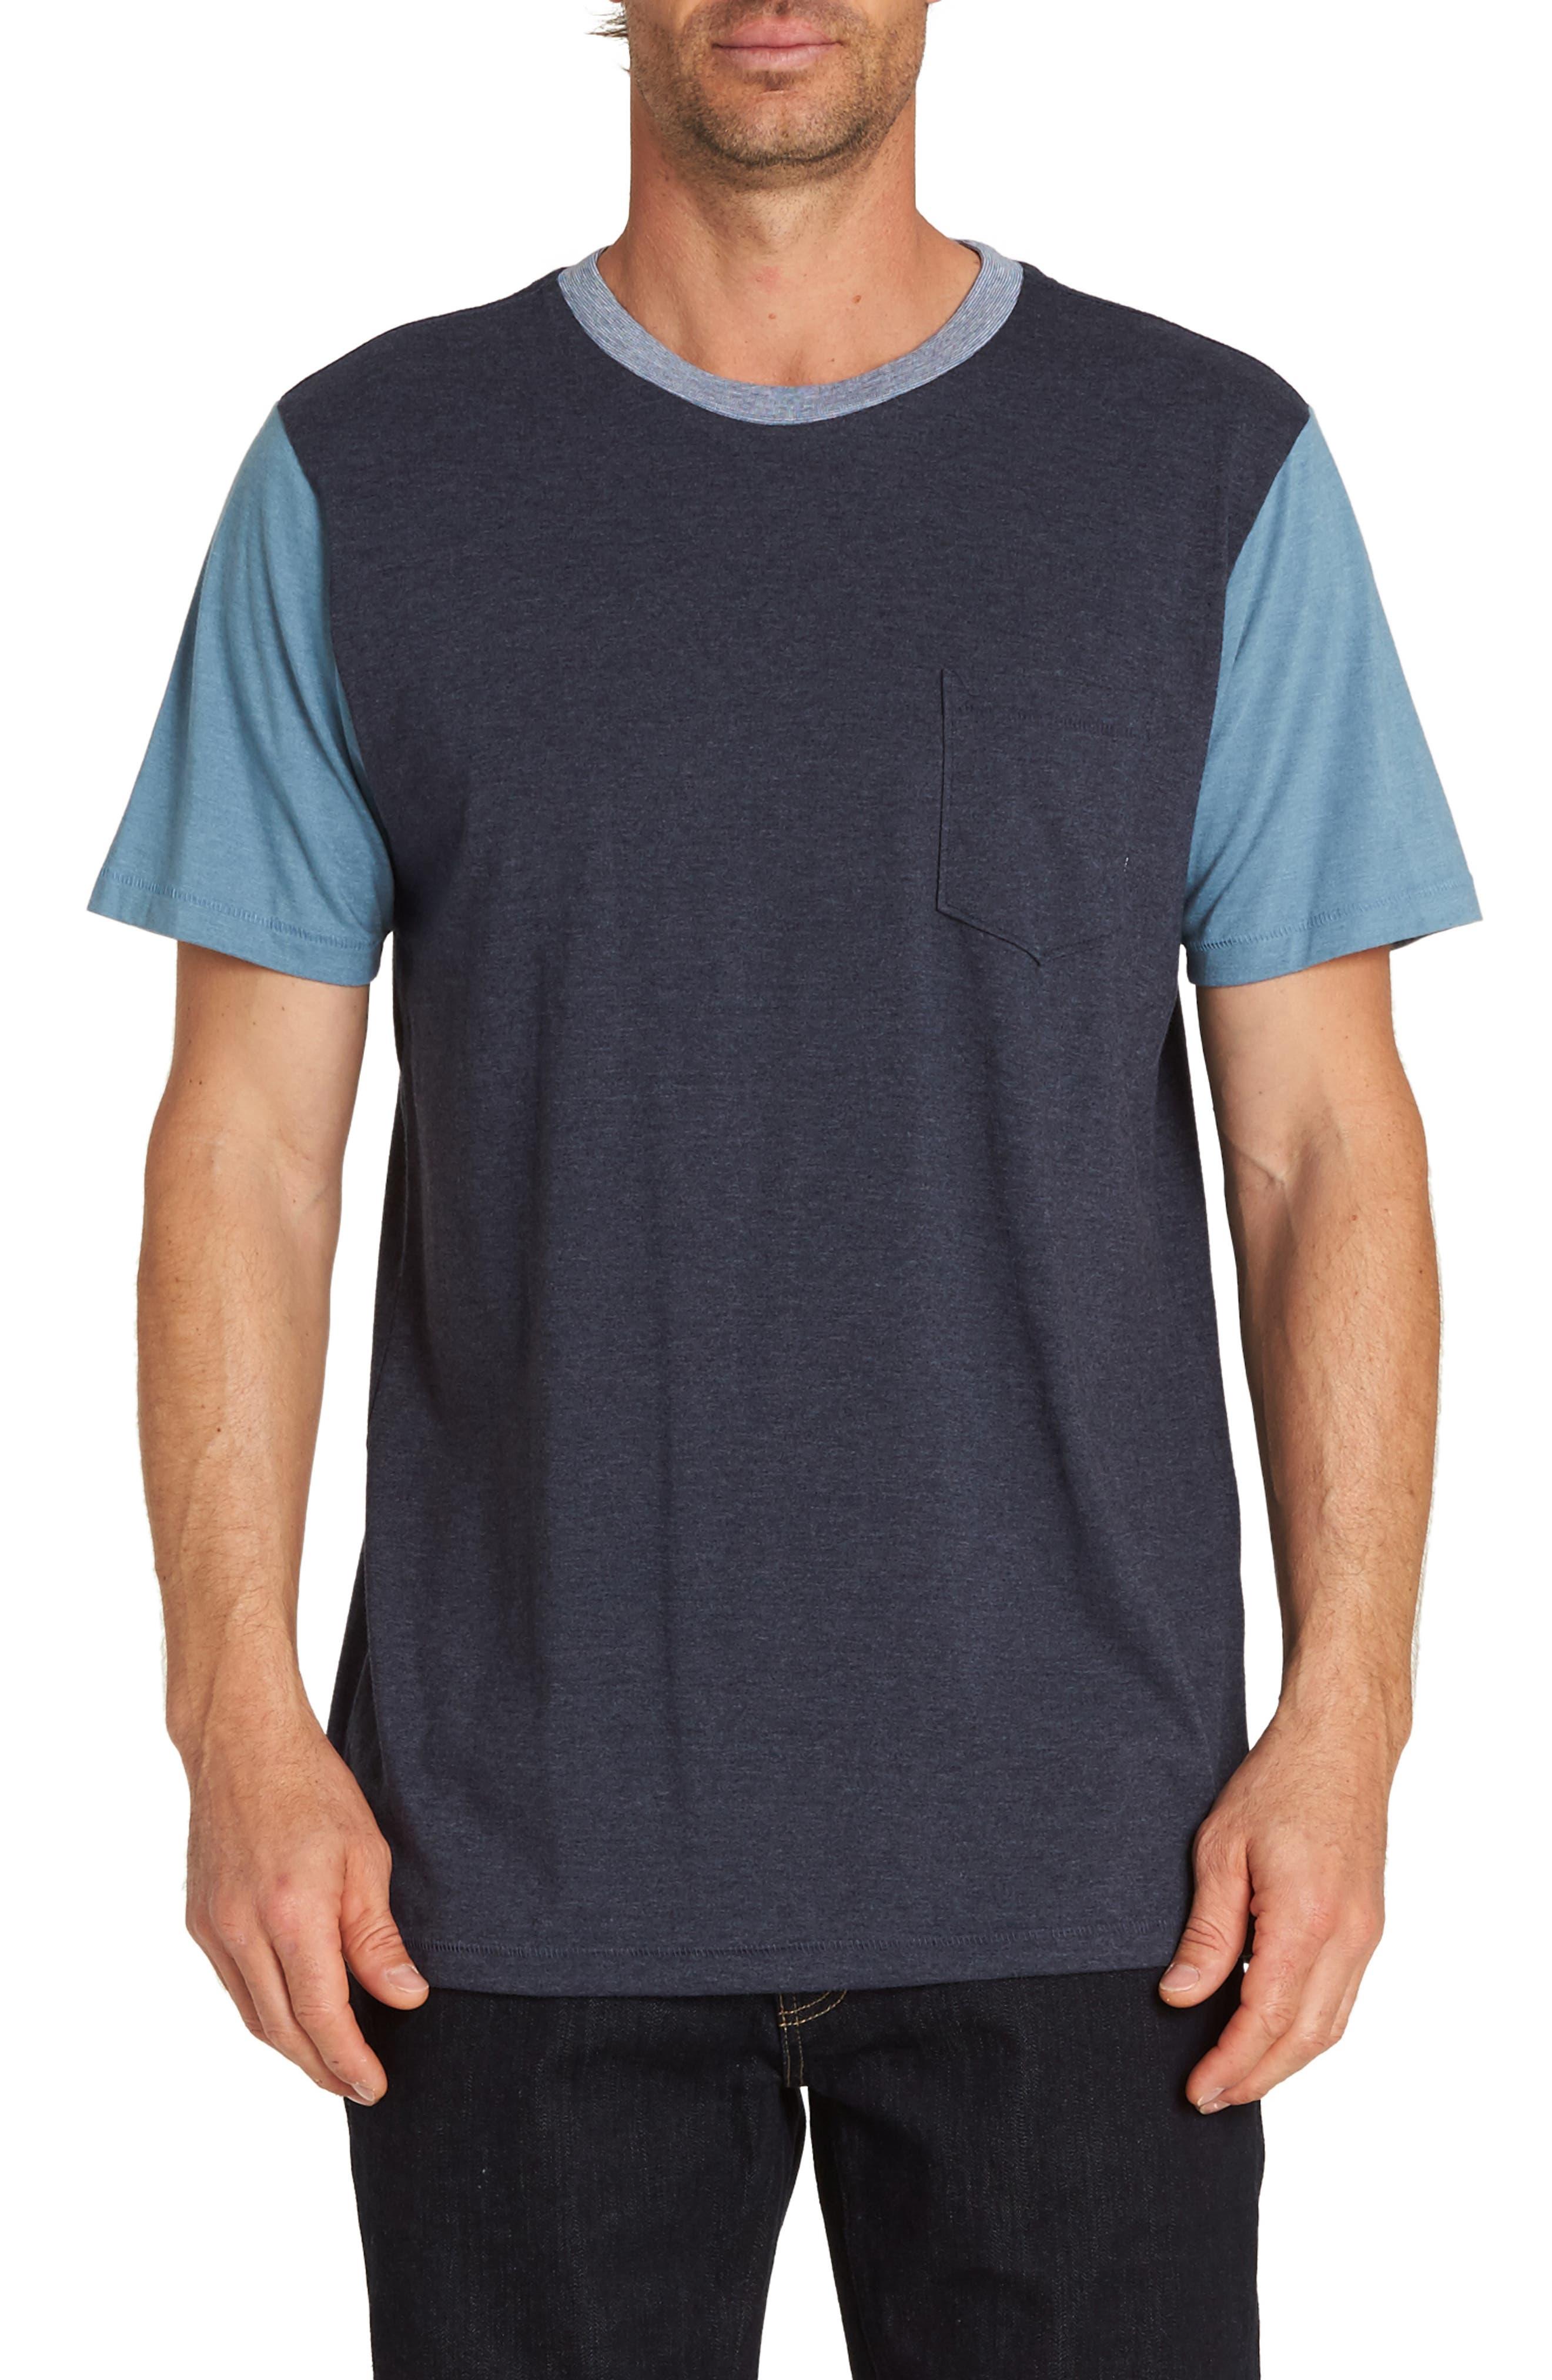 Zenith T-Shirt,                         Main,                         color, NAVY